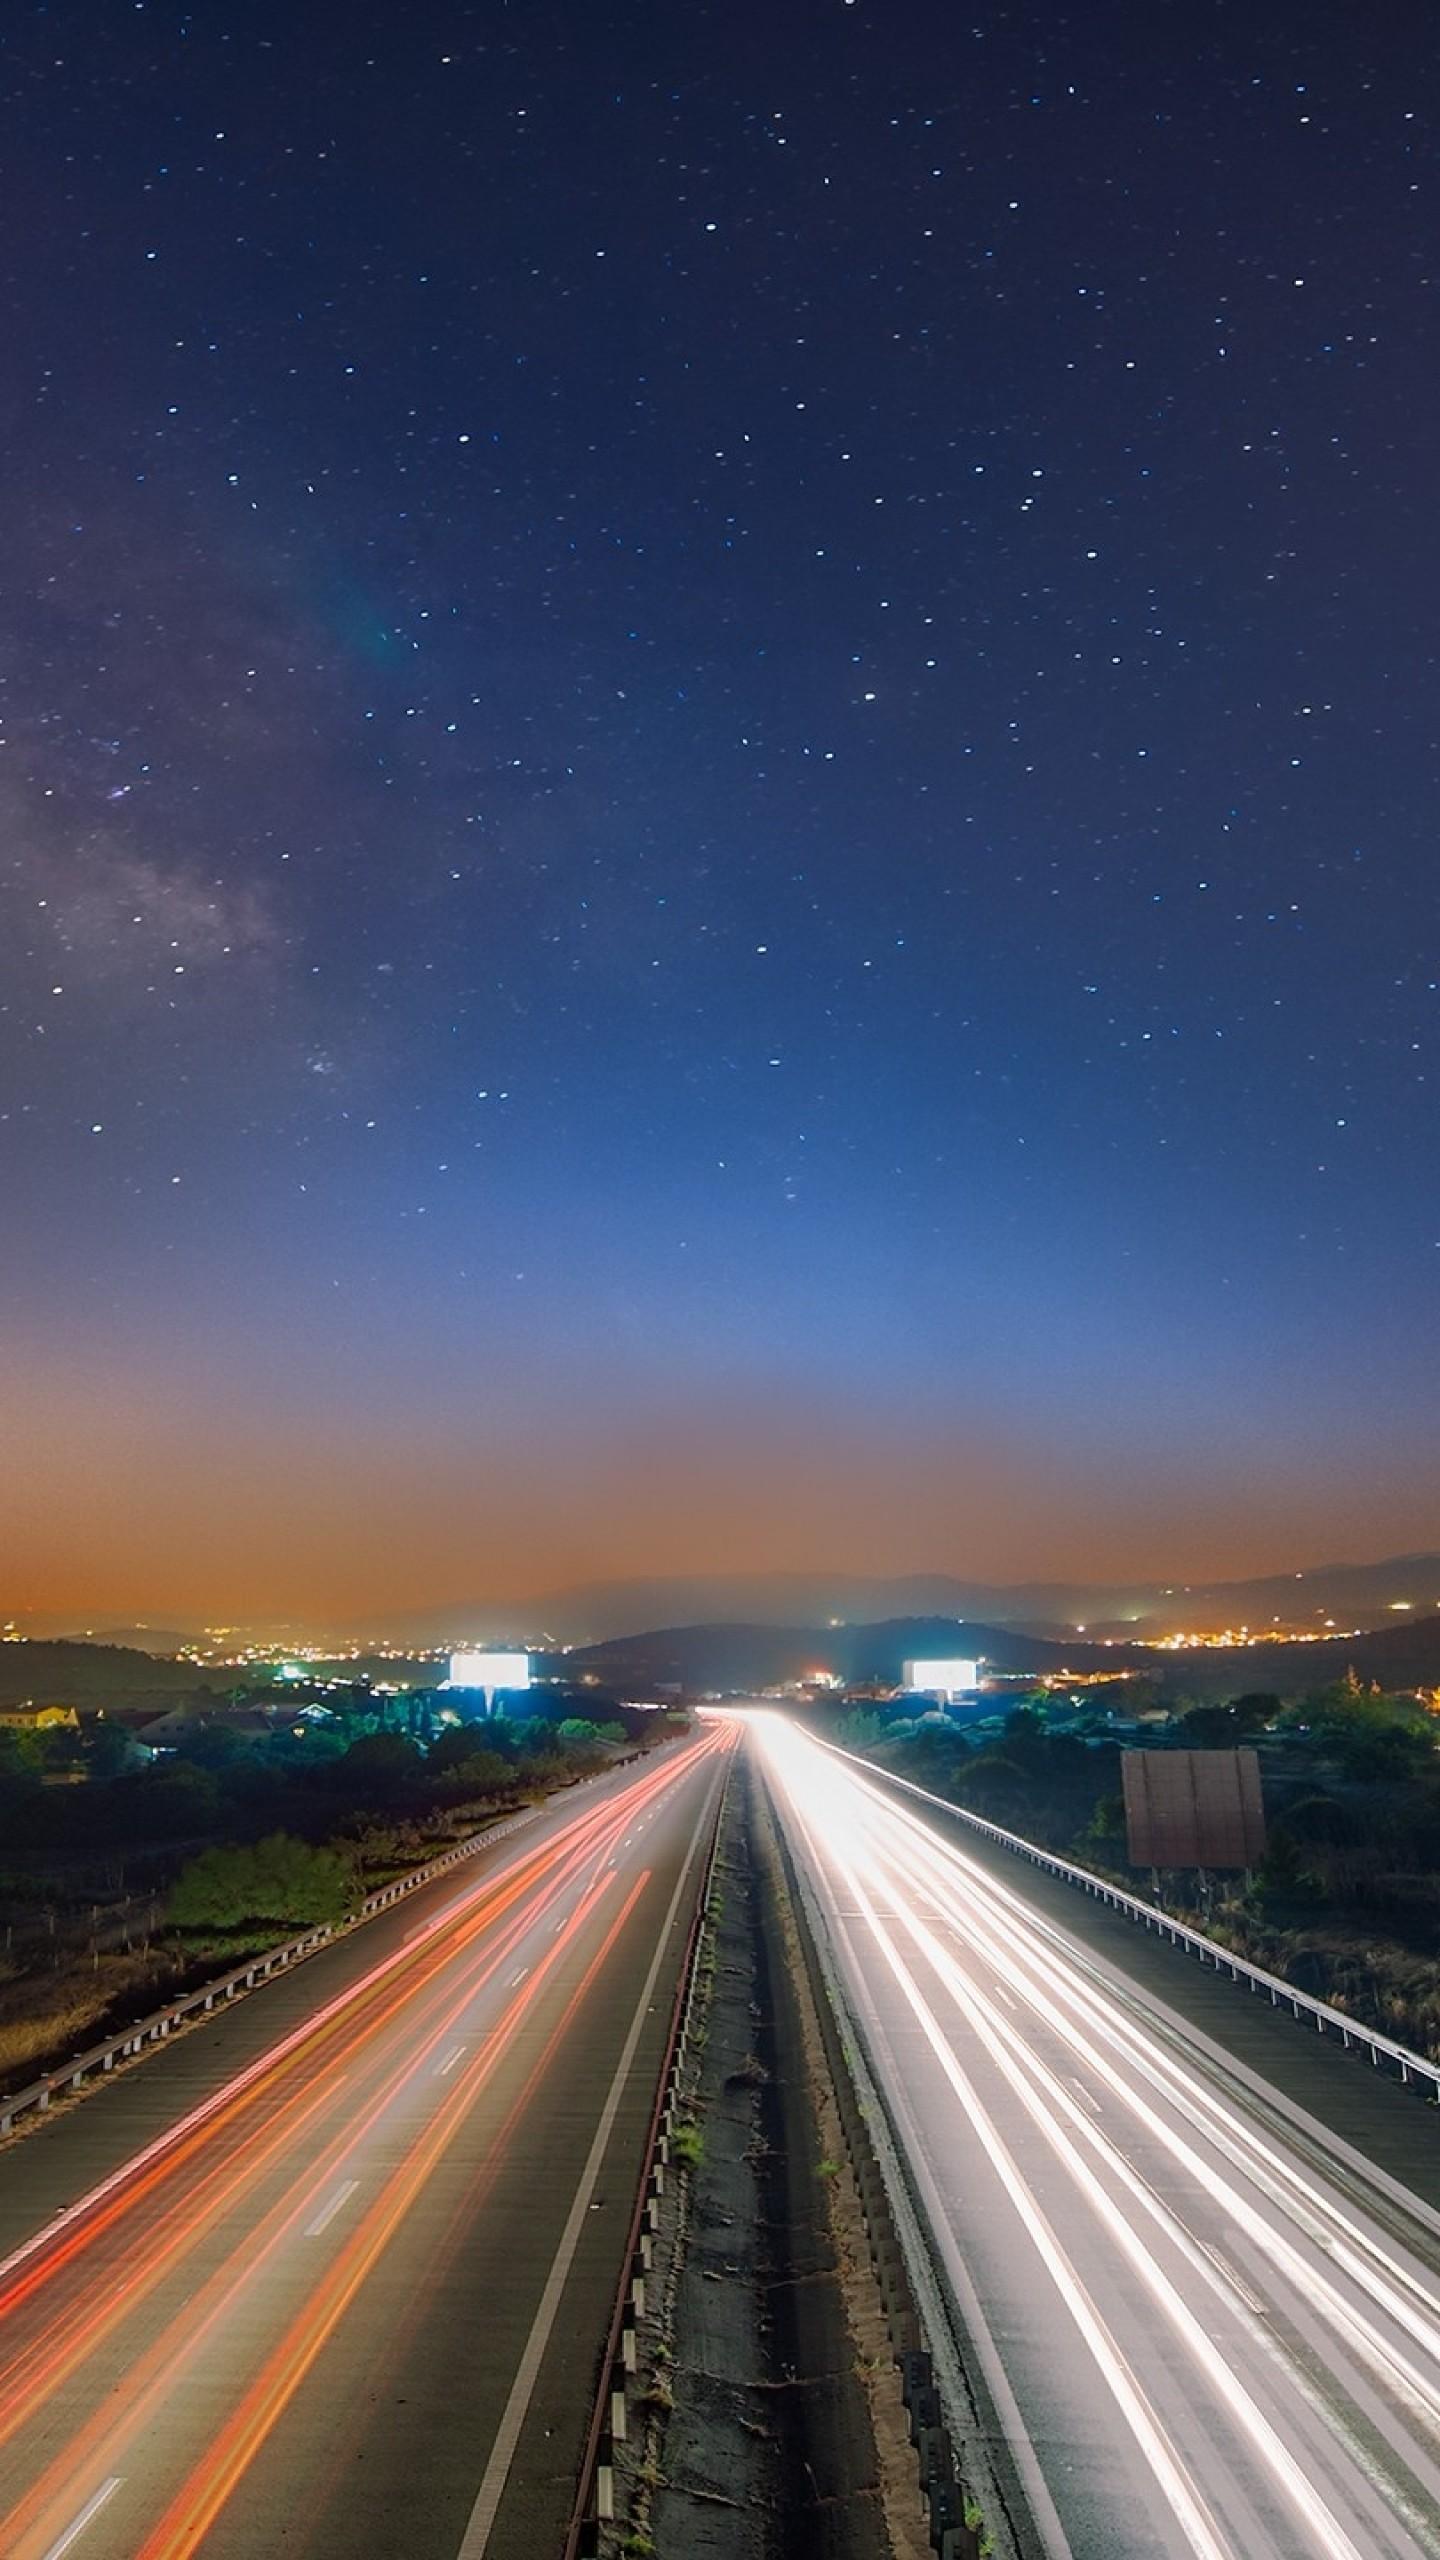 Wallpaper starry sky, night, road, traffic